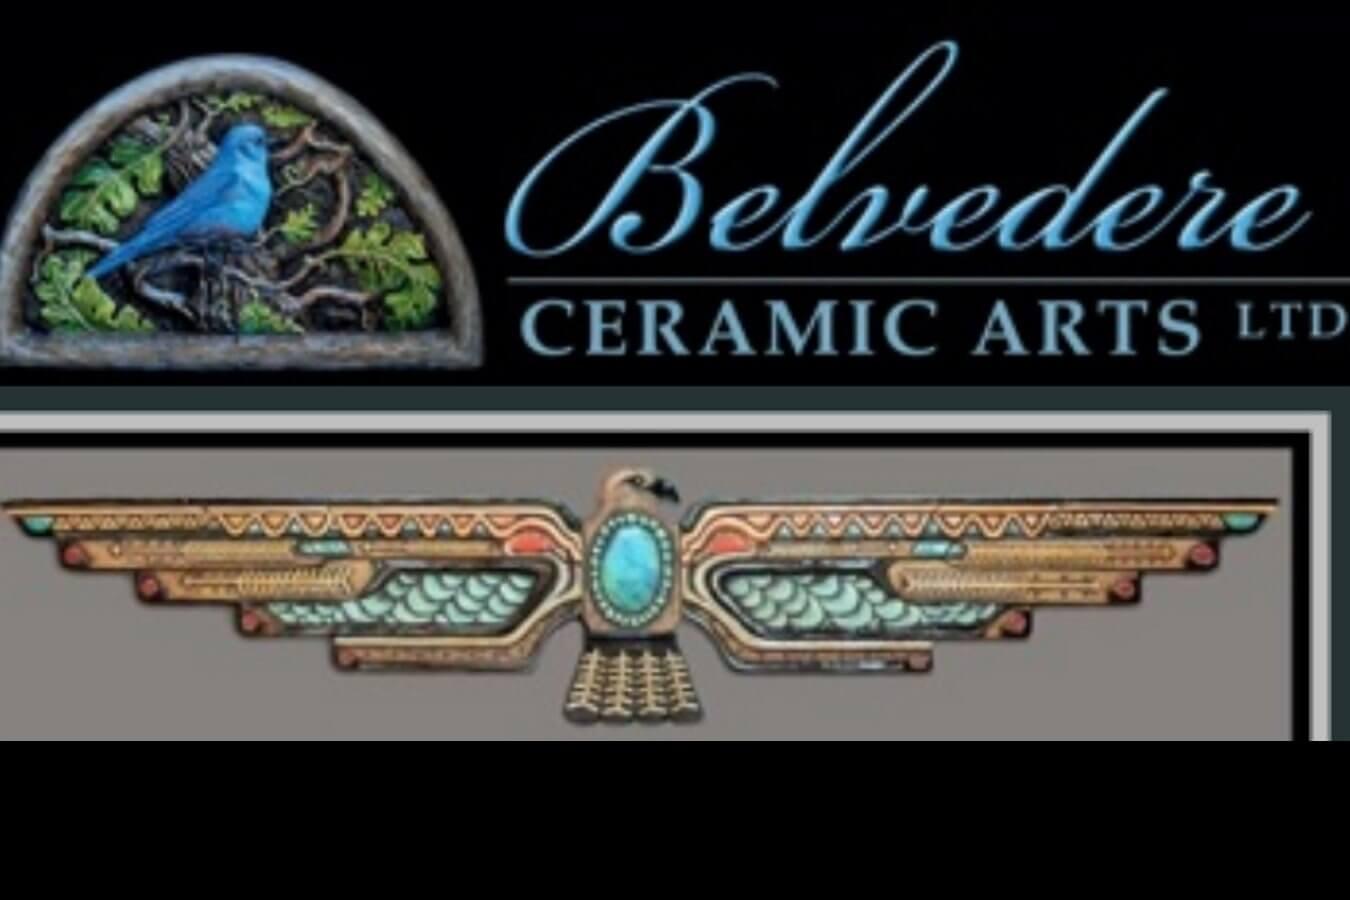 Belvedere Ceramic Arts Ltd